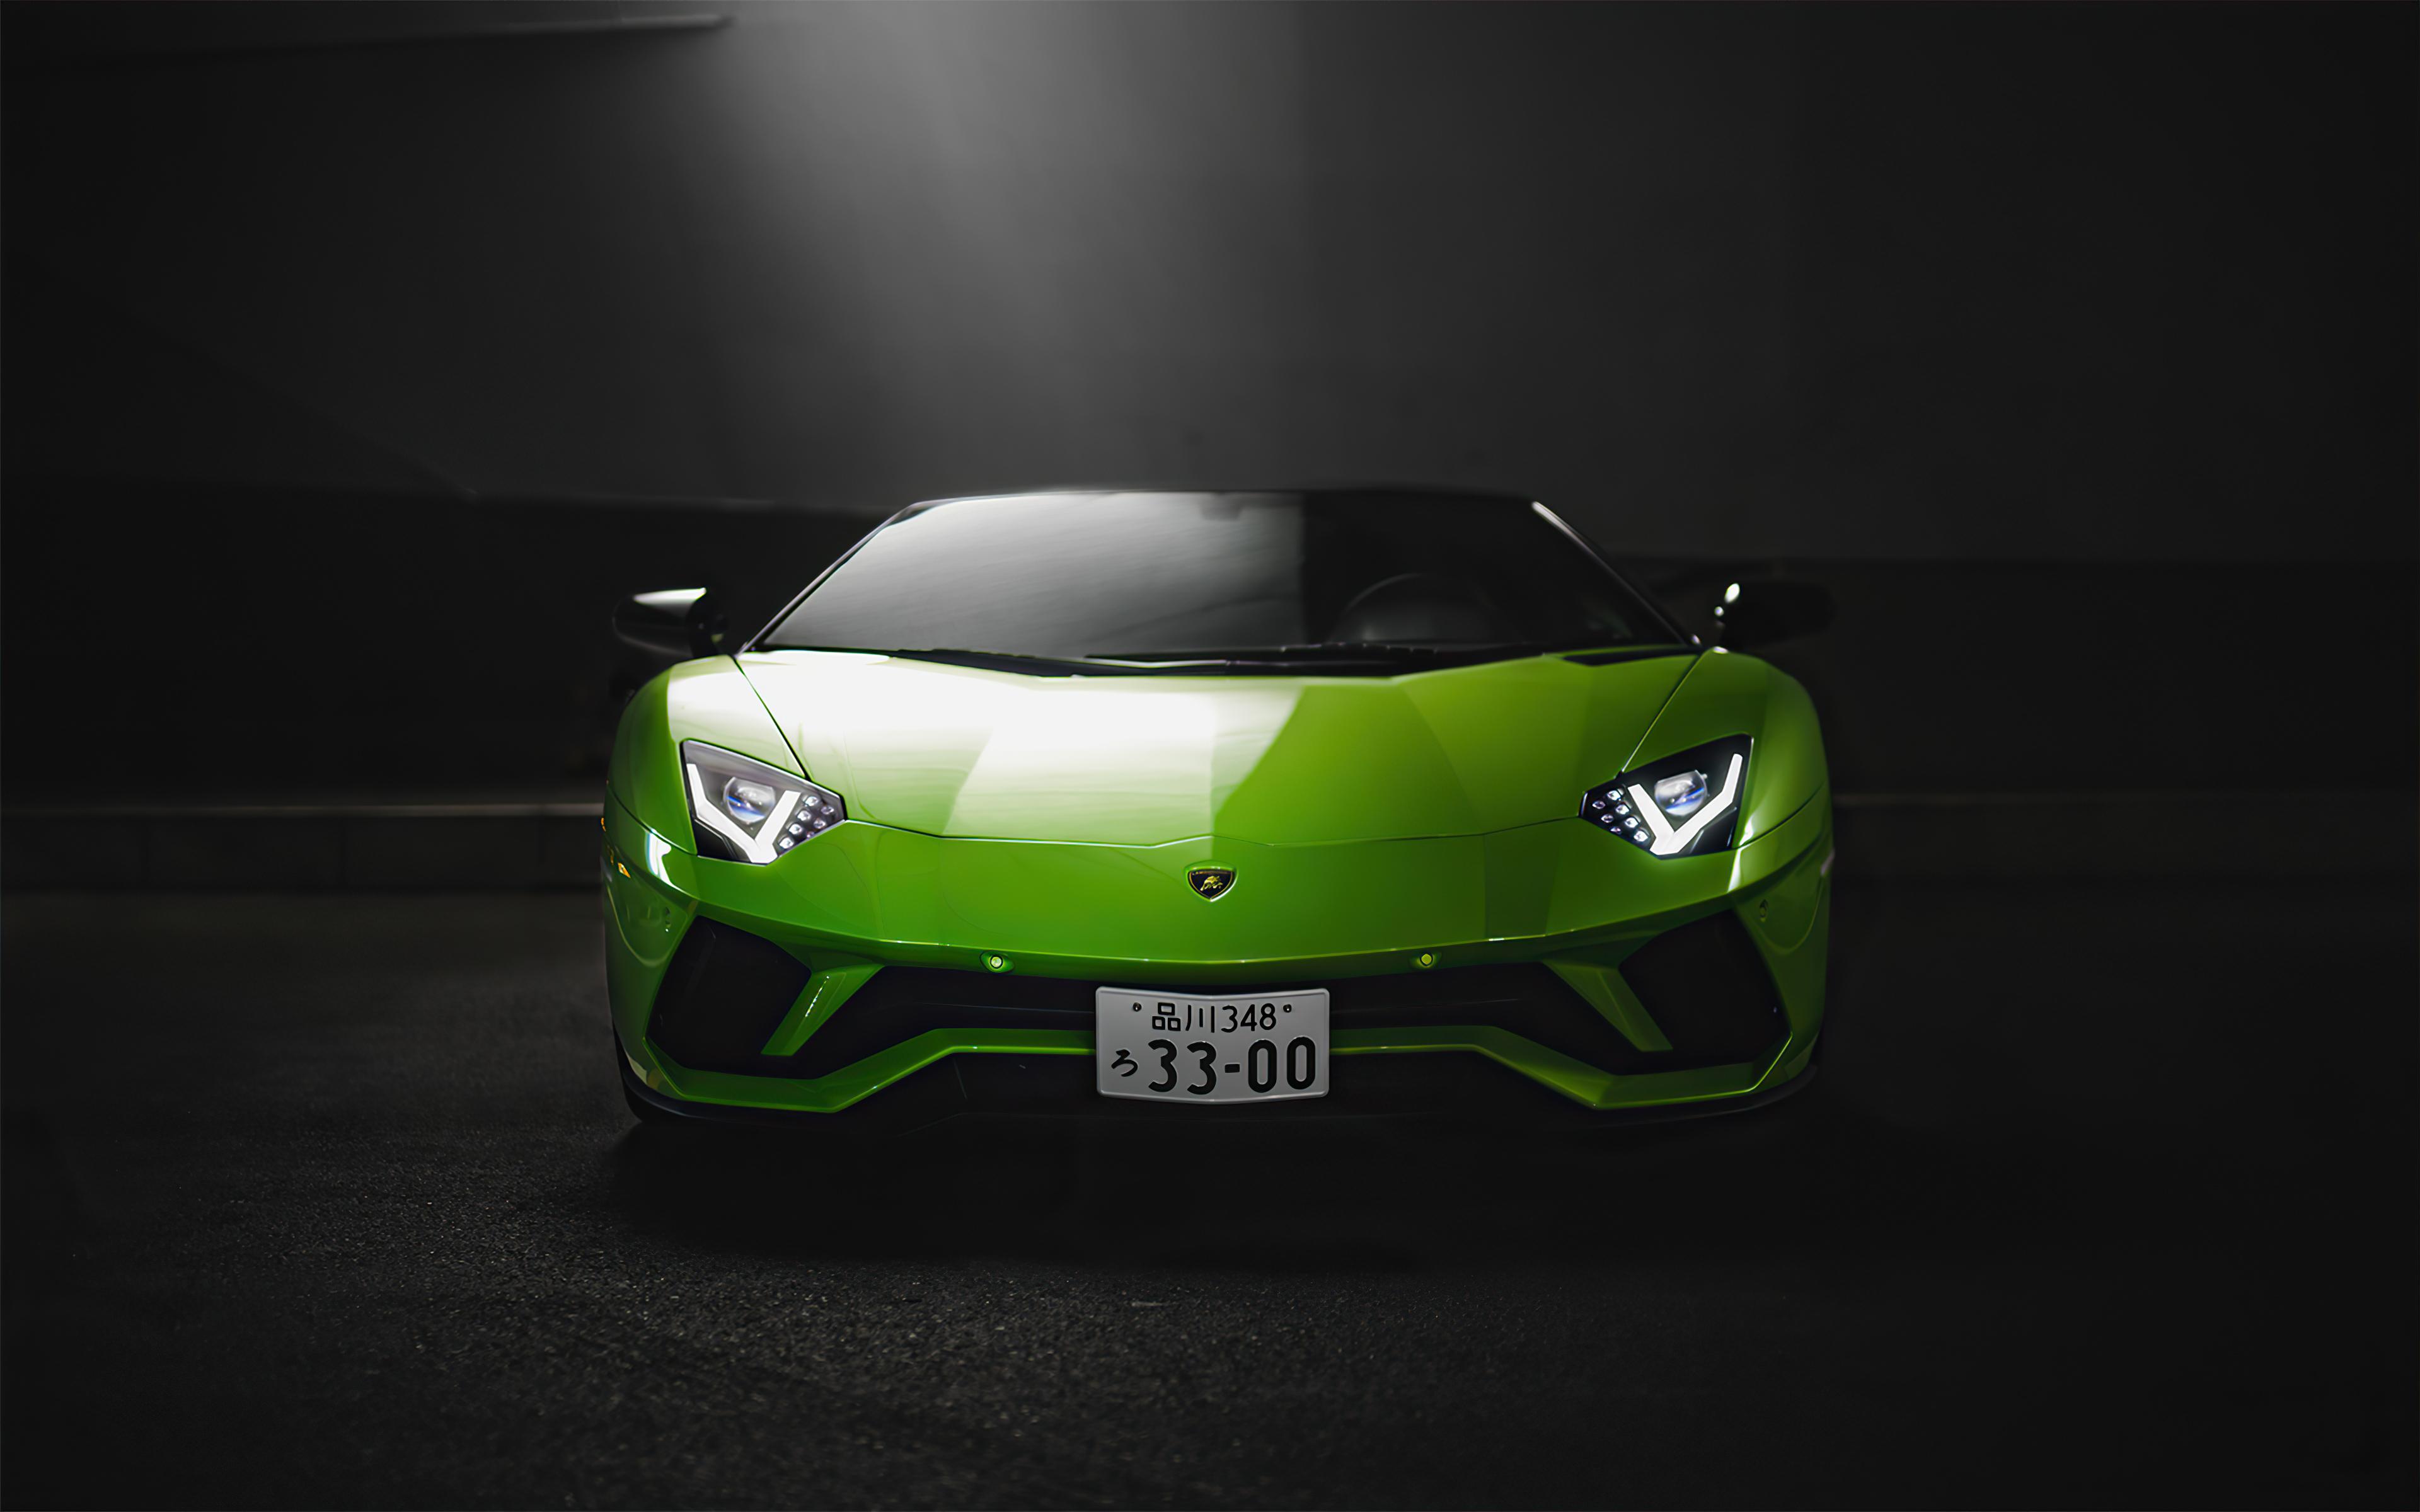 green lamborghini aventador s roadster 4k 1620171763 - Green Lamborghini Aventador S Roadster 4k - Green Lamborghini Aventador S Roadster 4k wallpapers